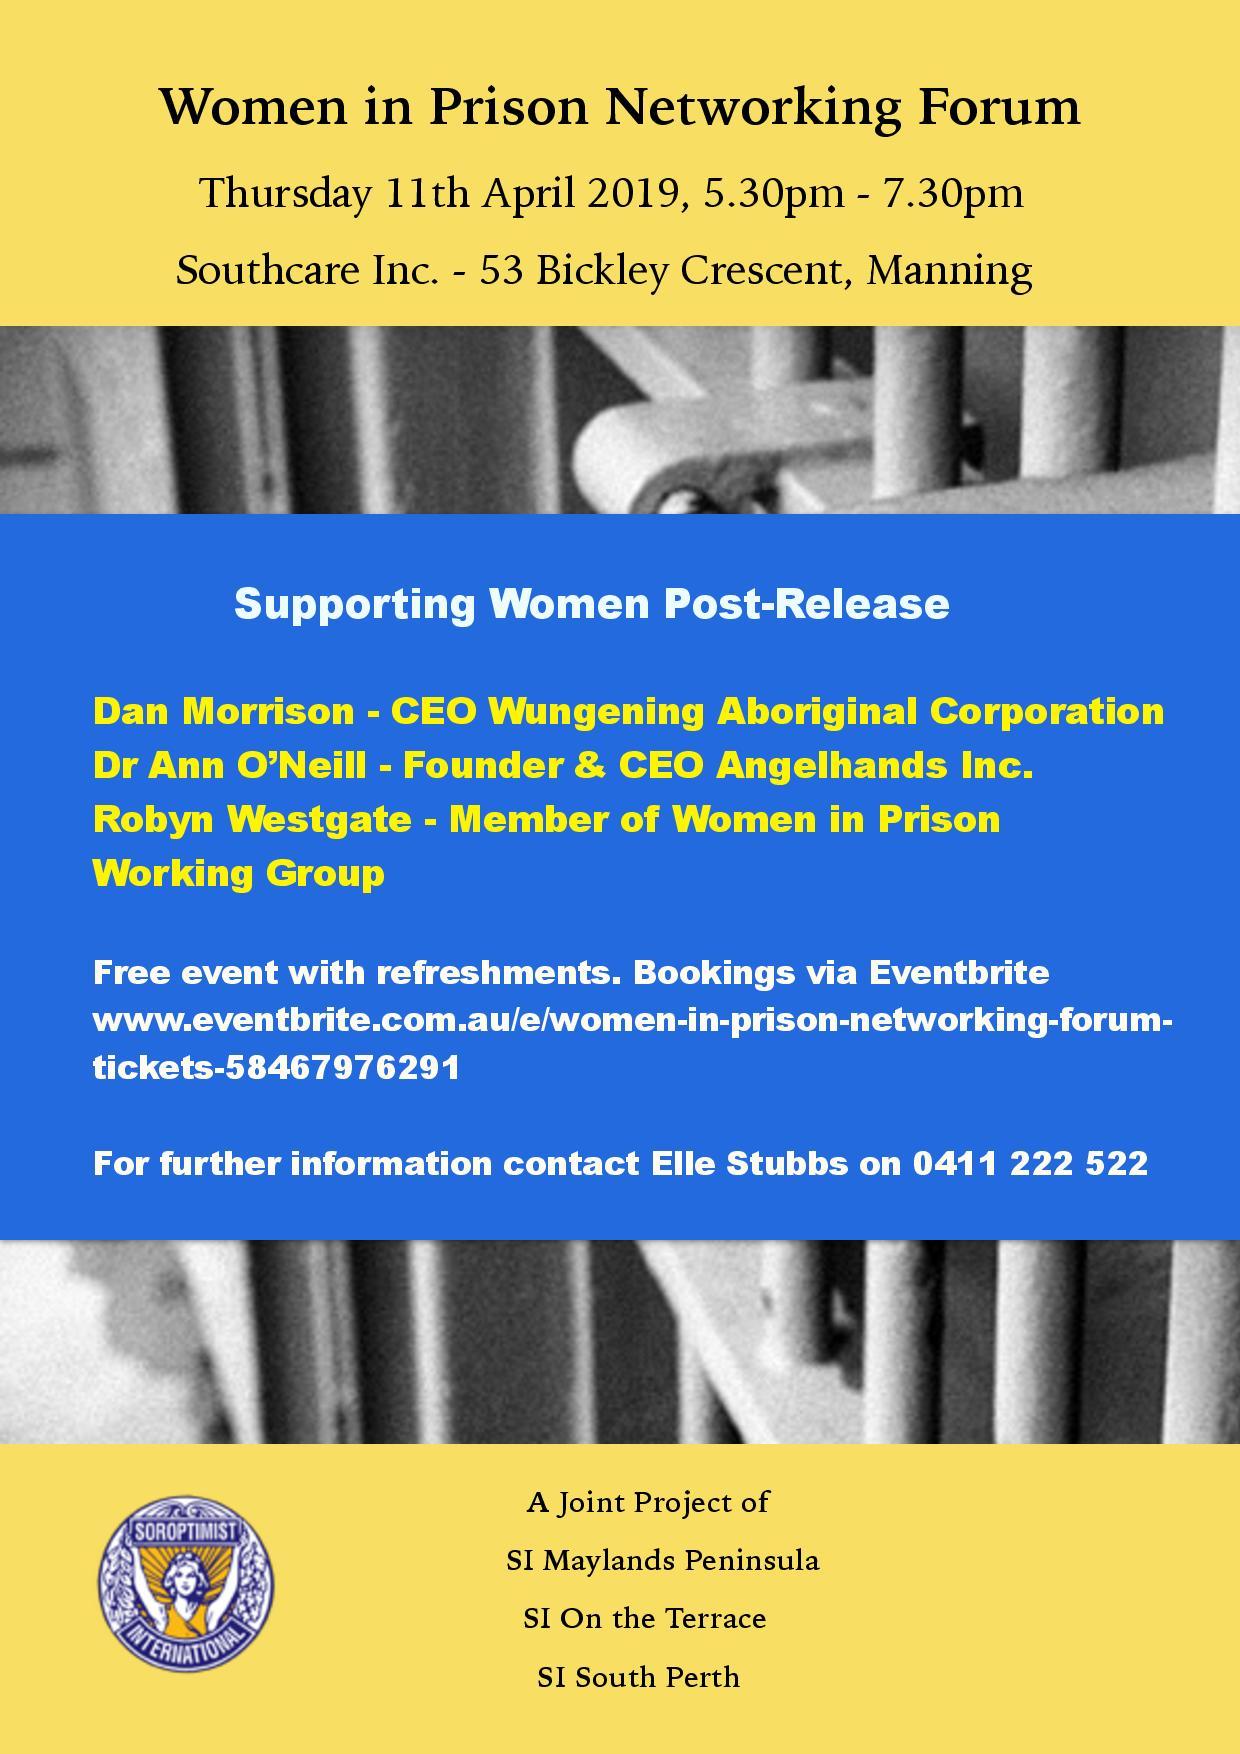 WIP-Networking-Forum